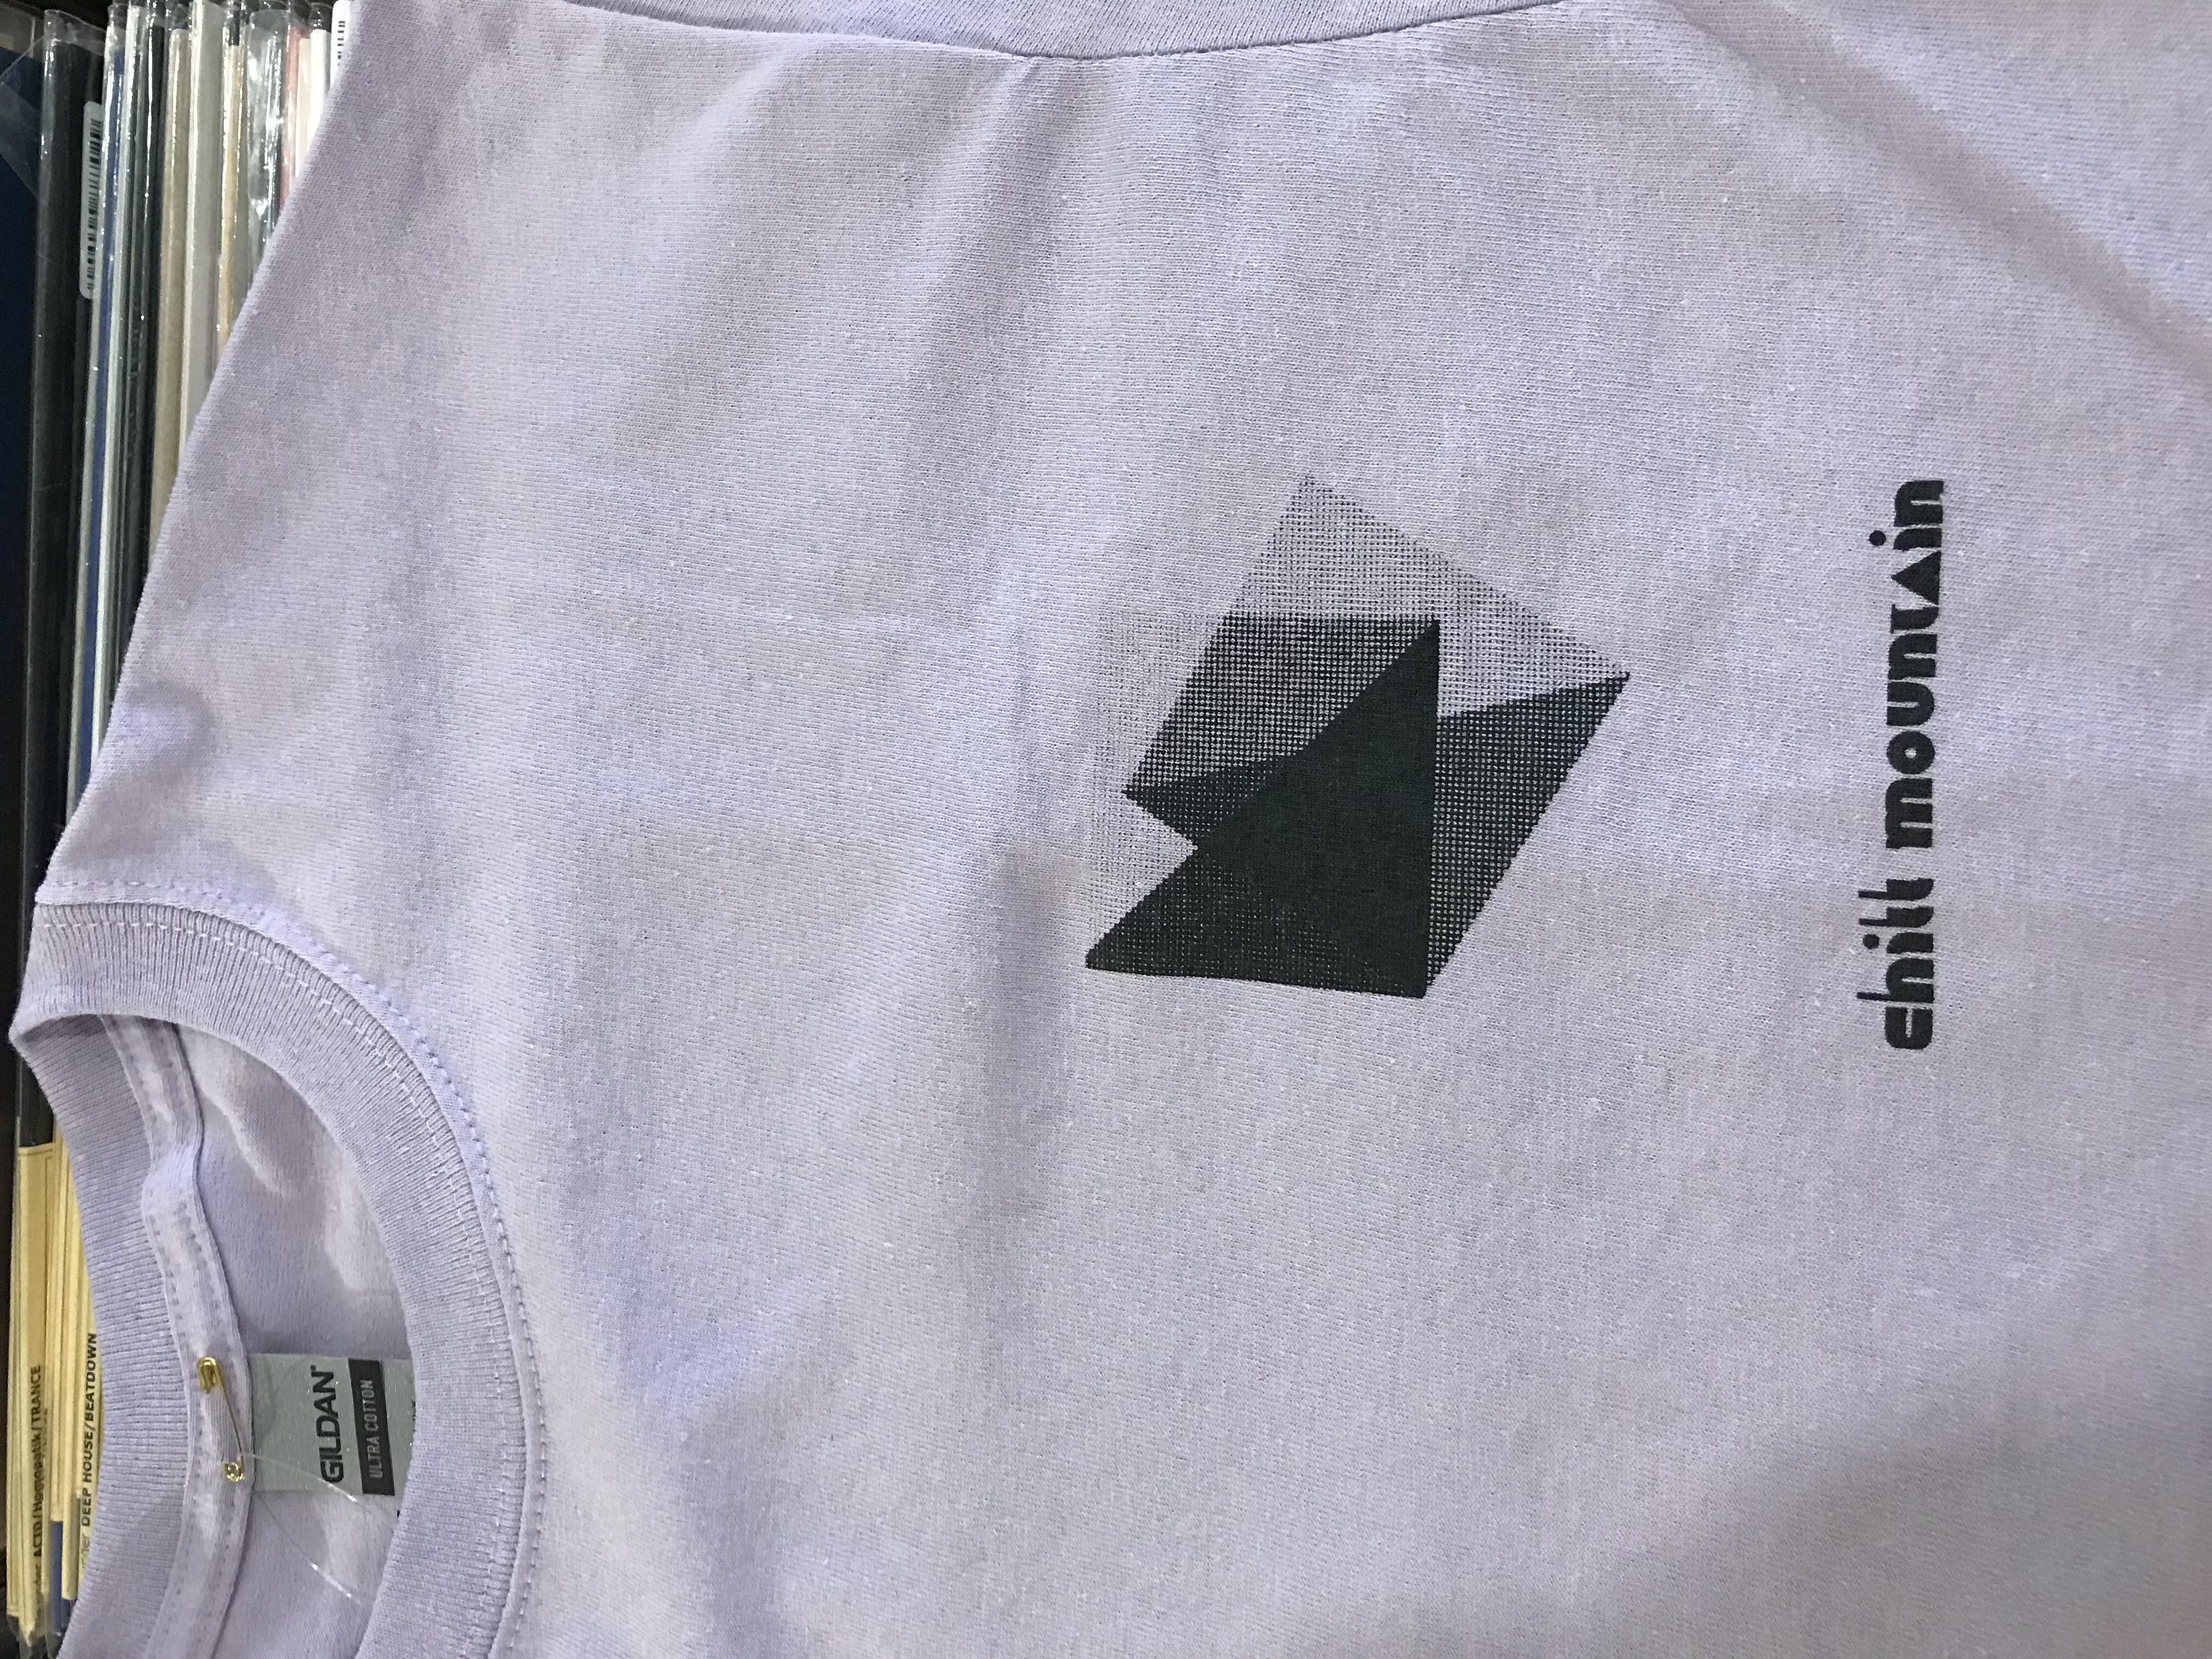 CHILL MOUNTAIN - chillmountain / Liquidanz T-shirts  LAVENDER Size L : WEAR gallery 2